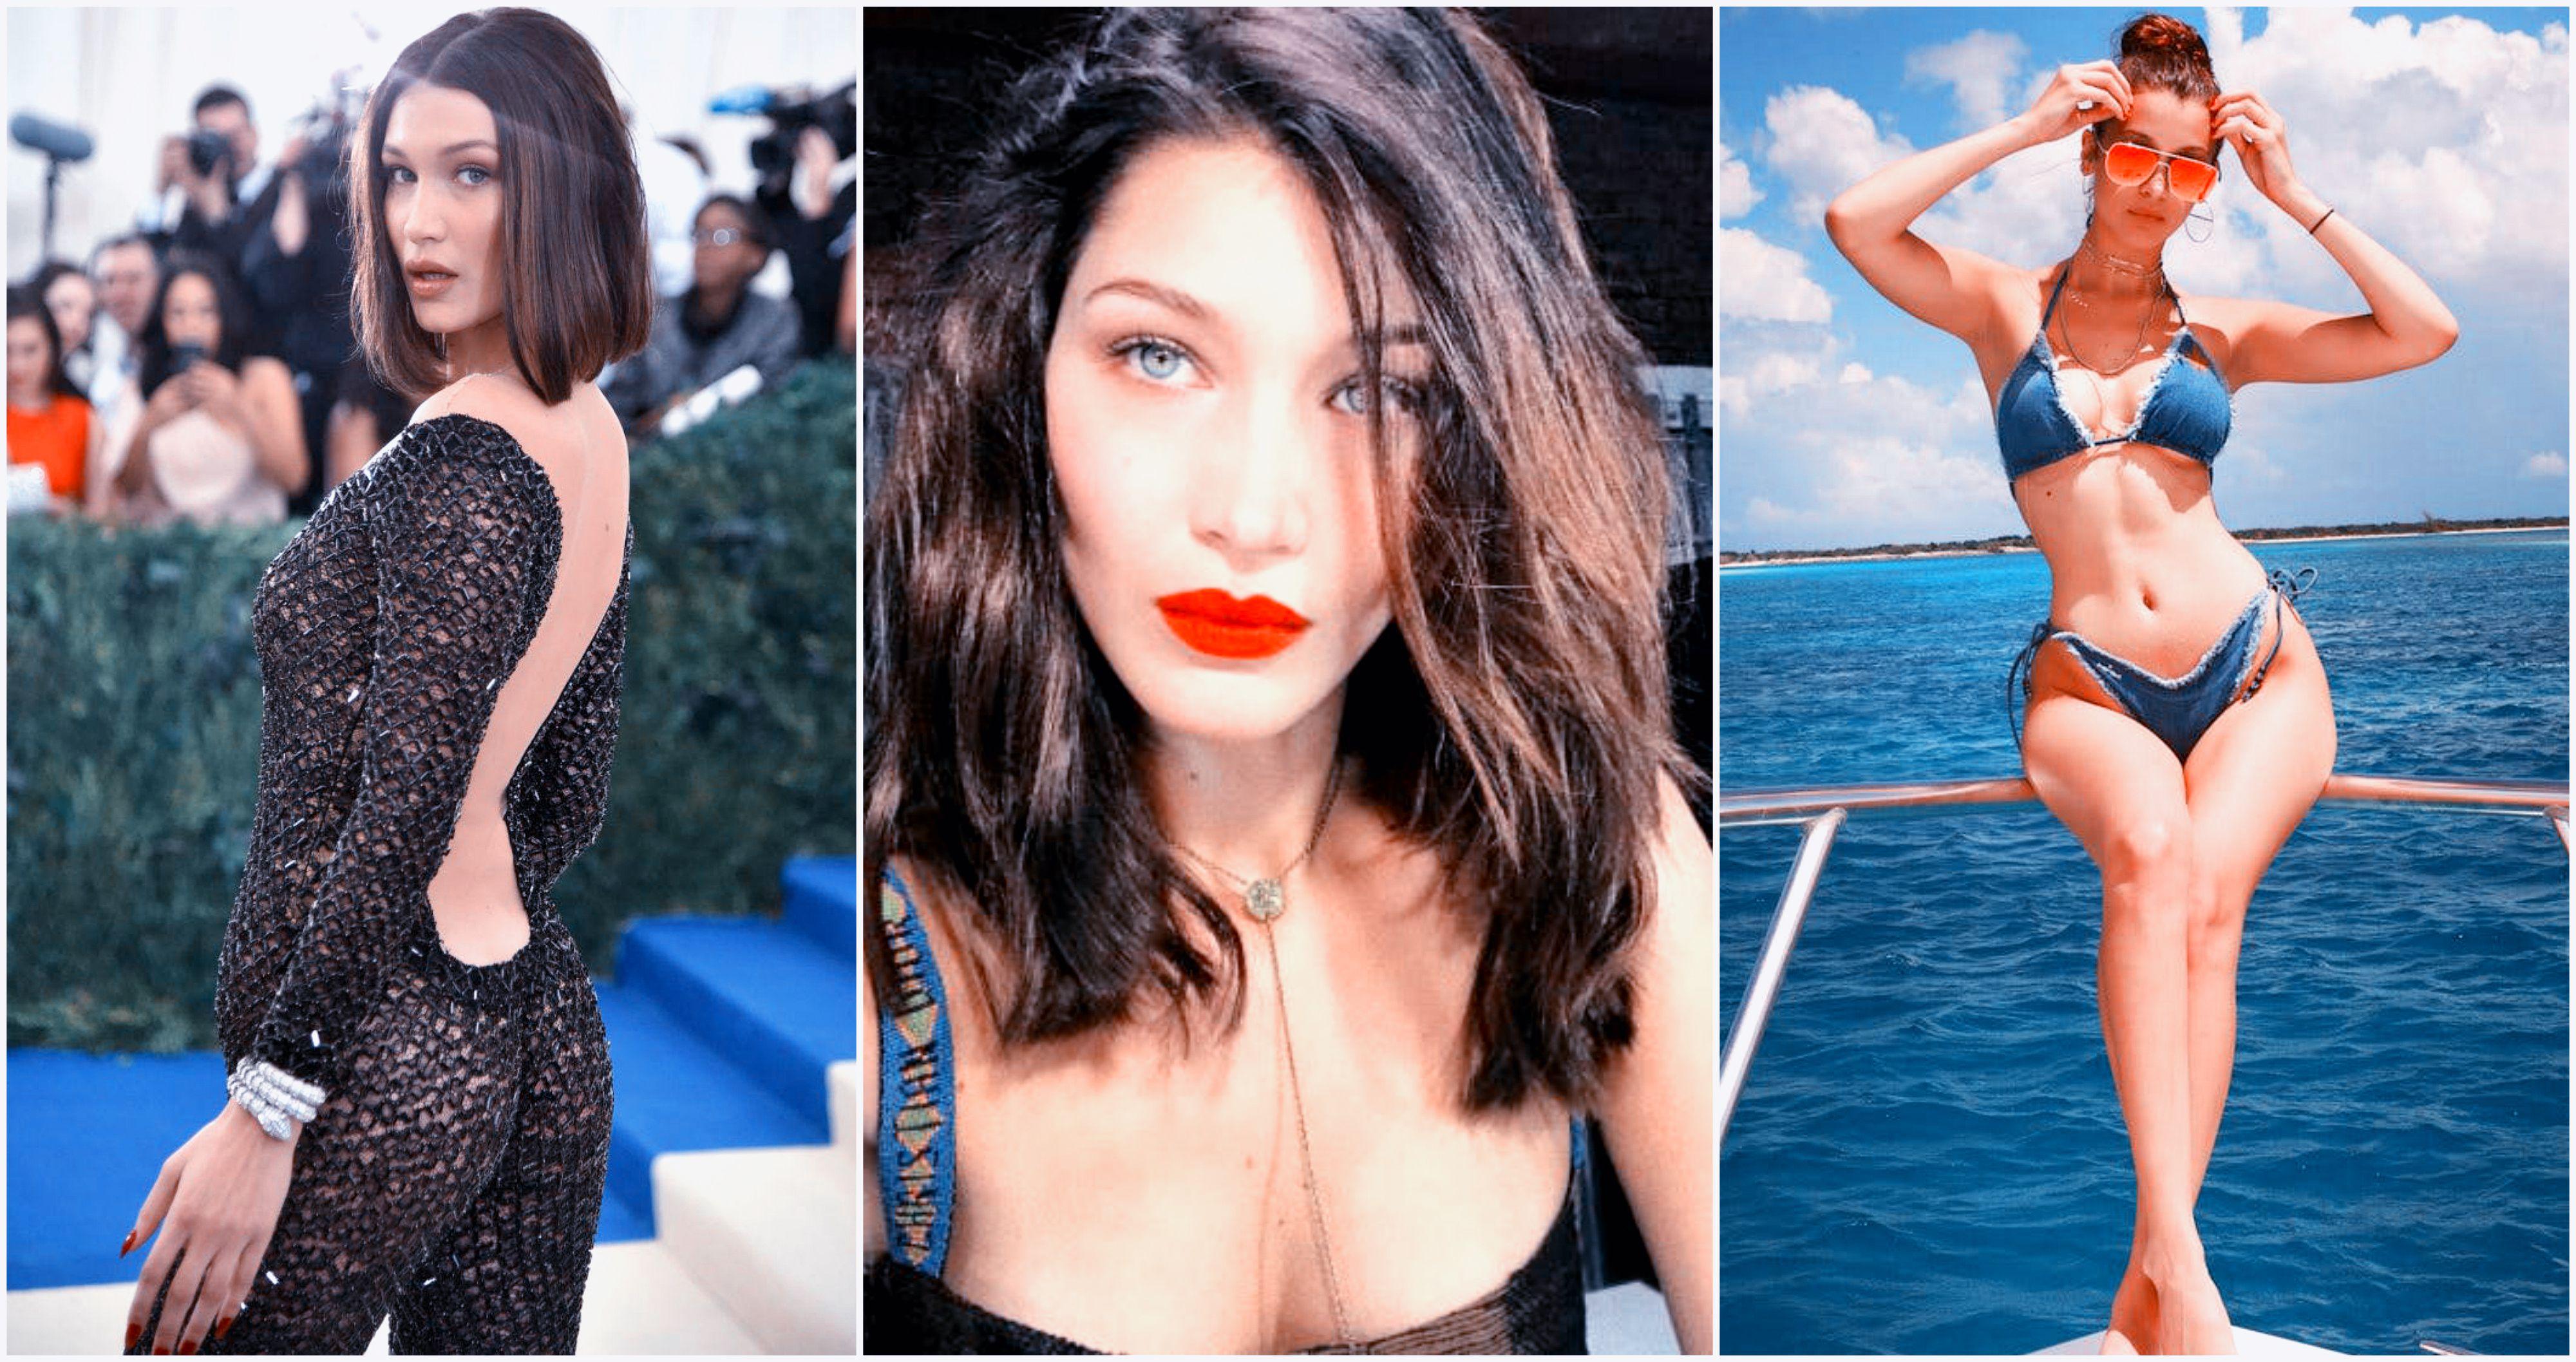 5bfb39983285 Pics That Prove Bella Hadid Is More Sizzling Than Gigi | TheTalko